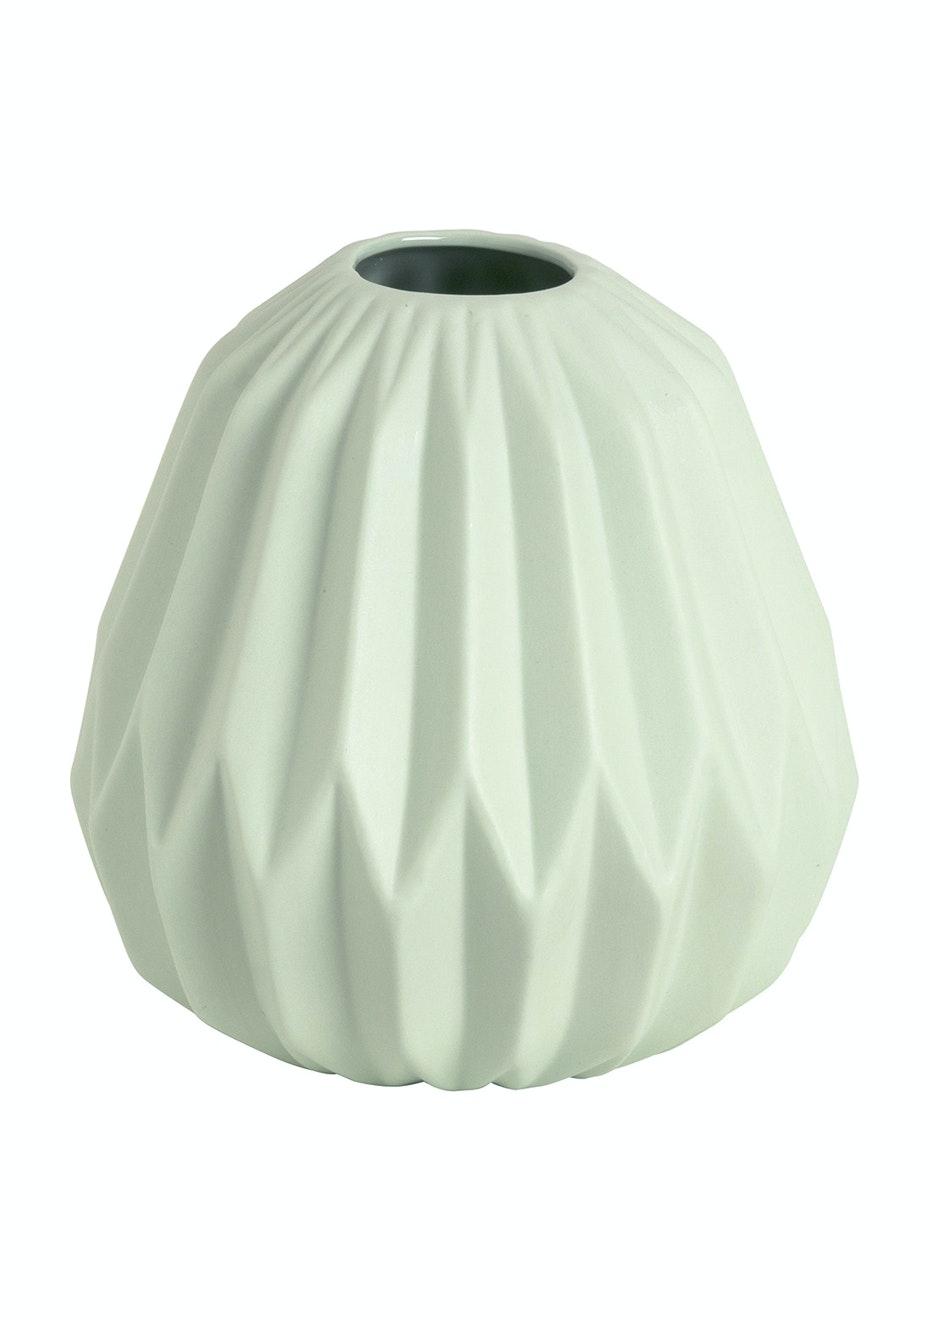 Jason - Geometric Vase - Sage